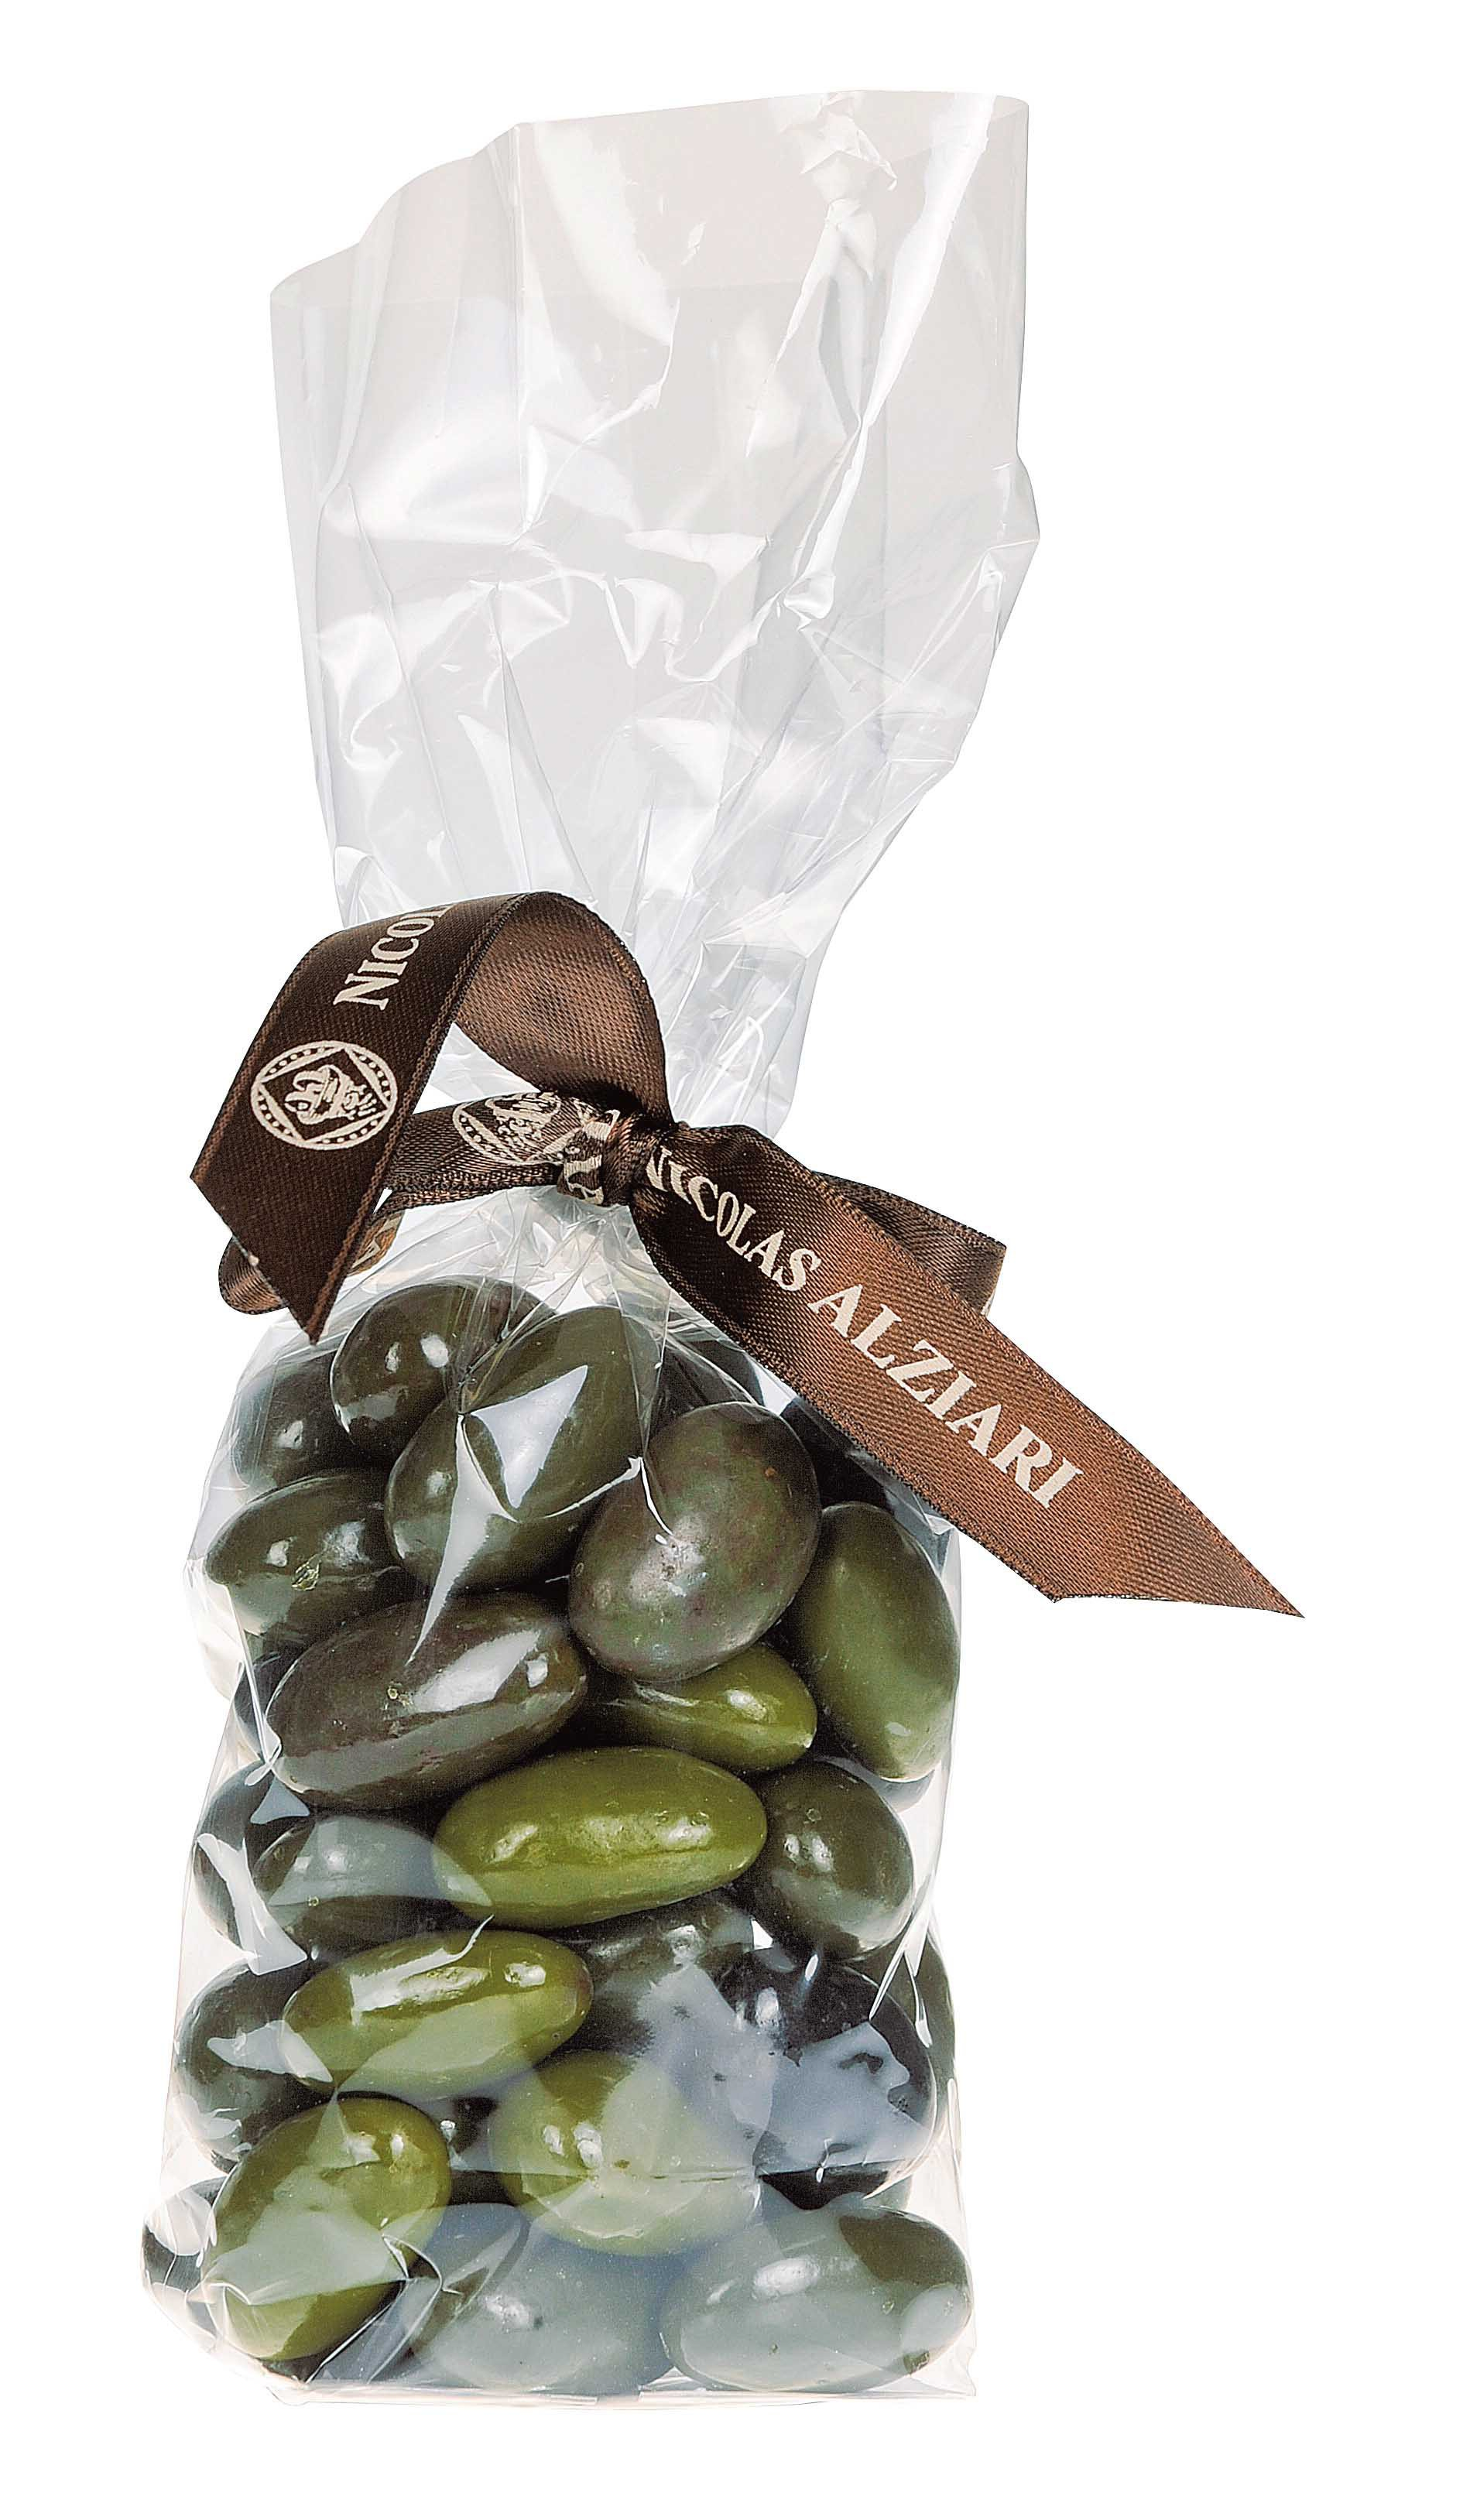 Olives en chocolat sachet 200g